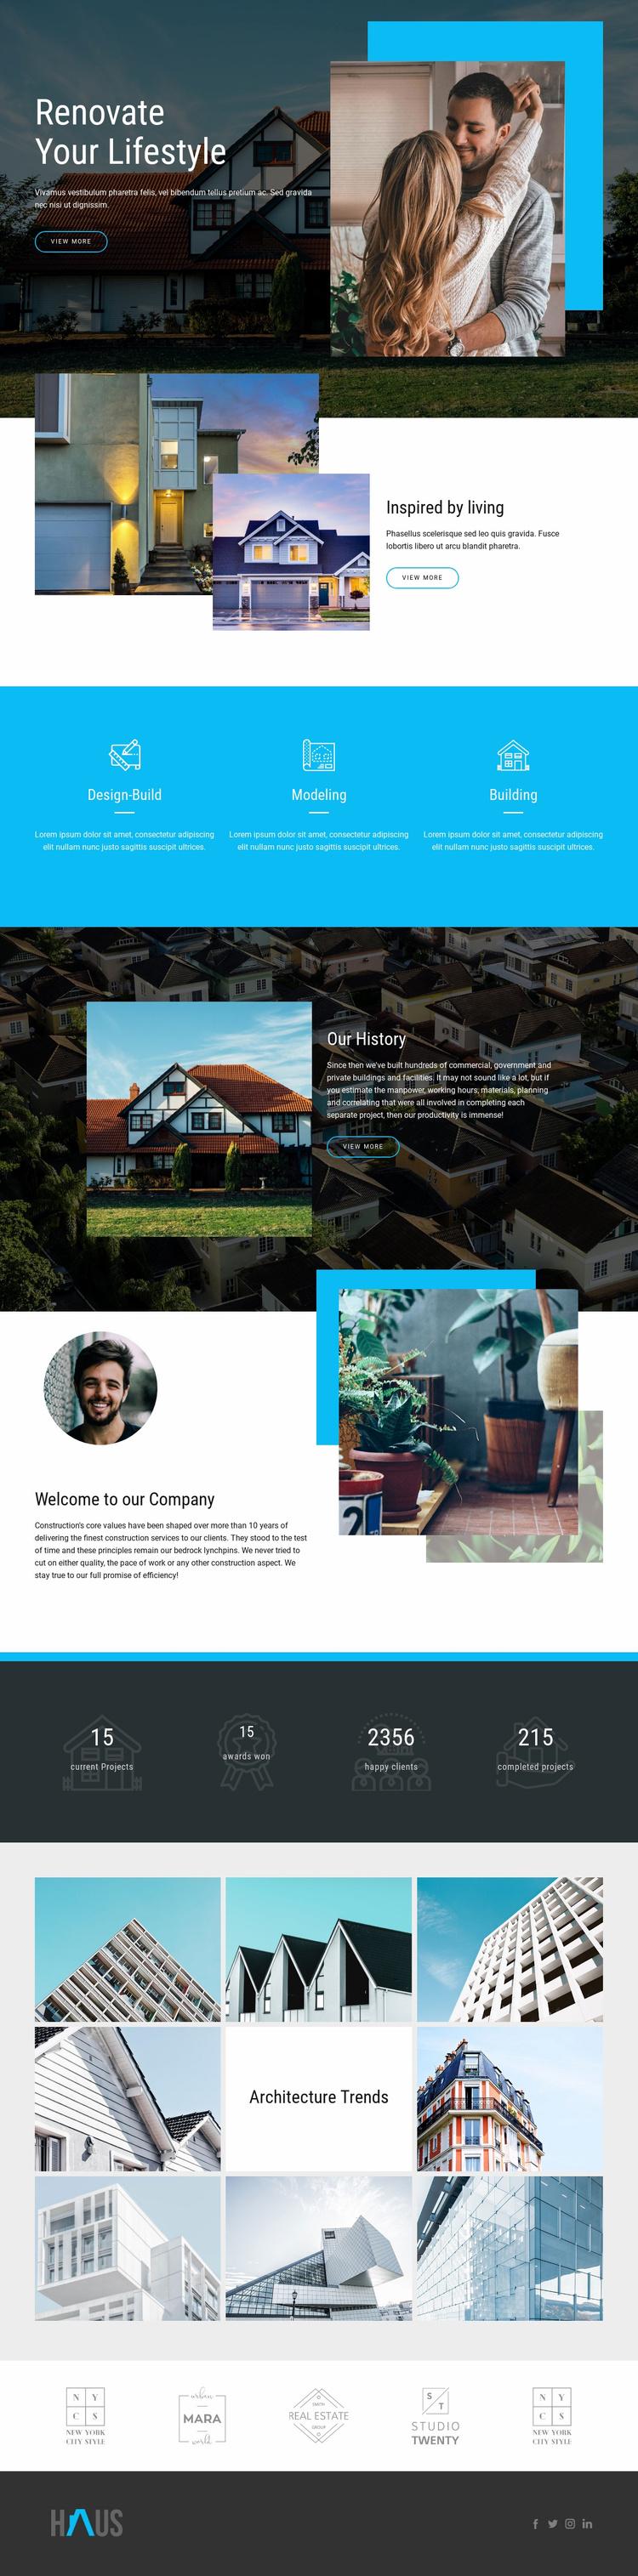 Renovate real estate Website Template